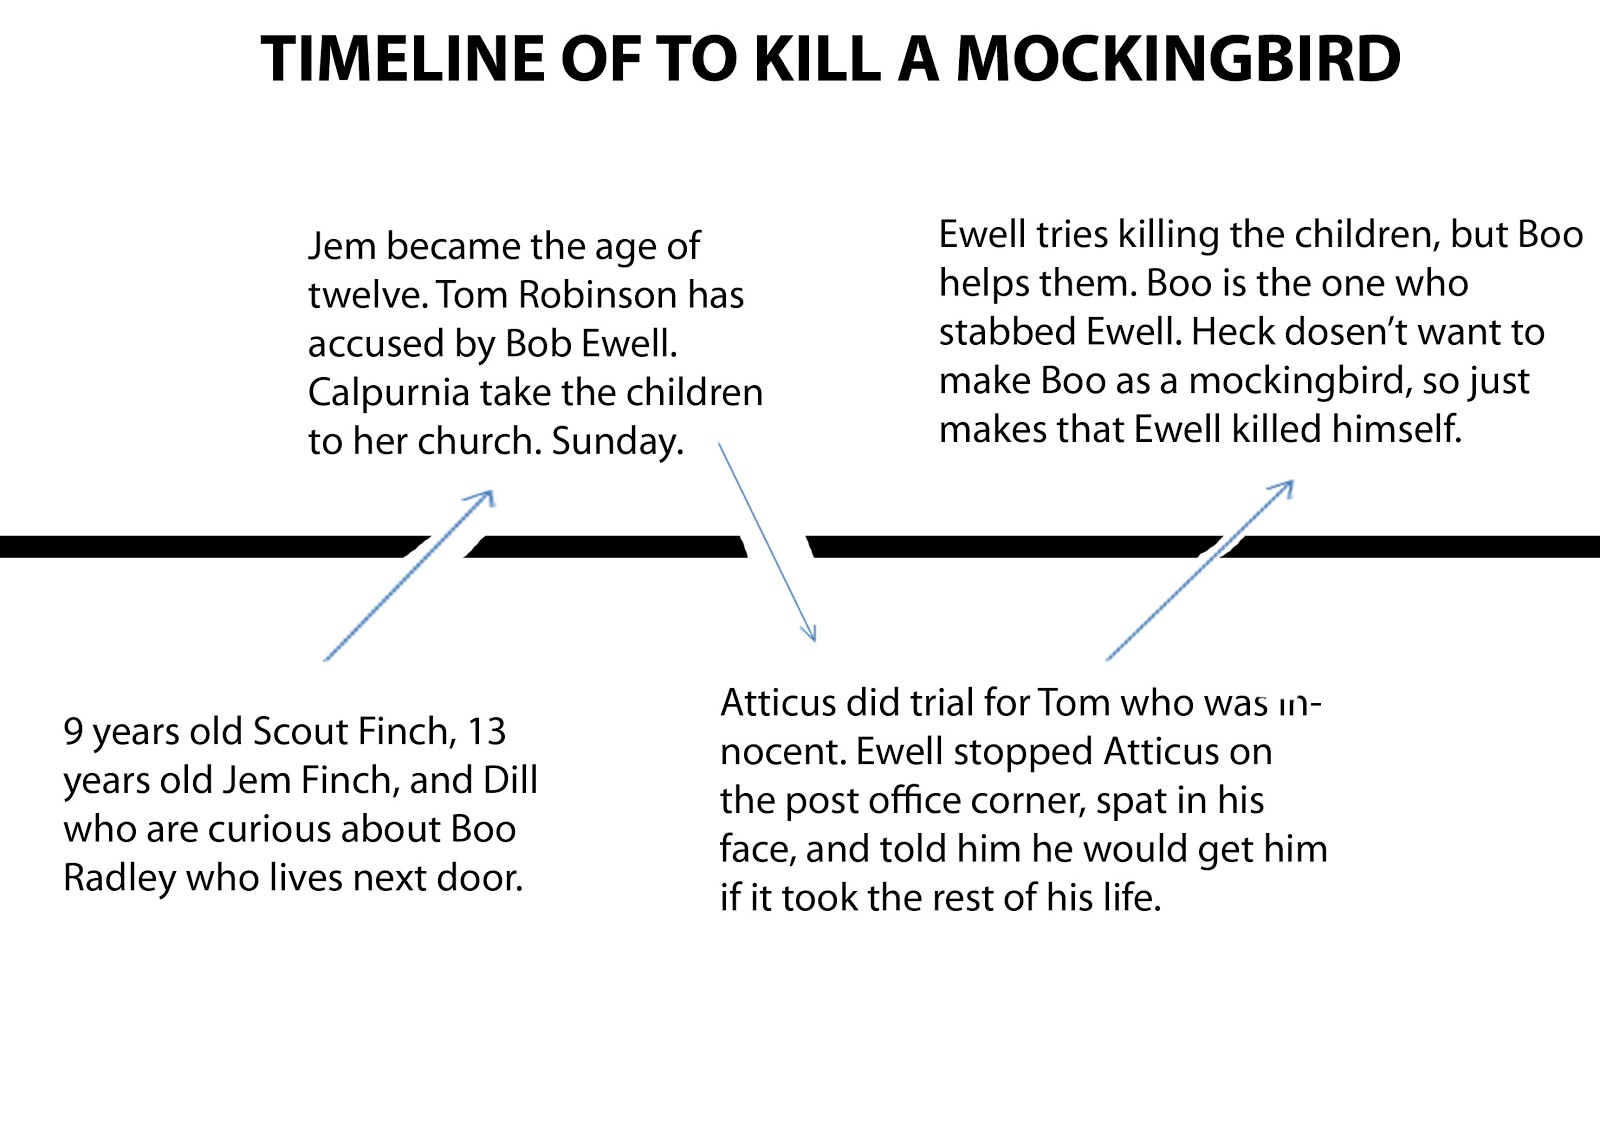 to kill a mockingbird timeline review